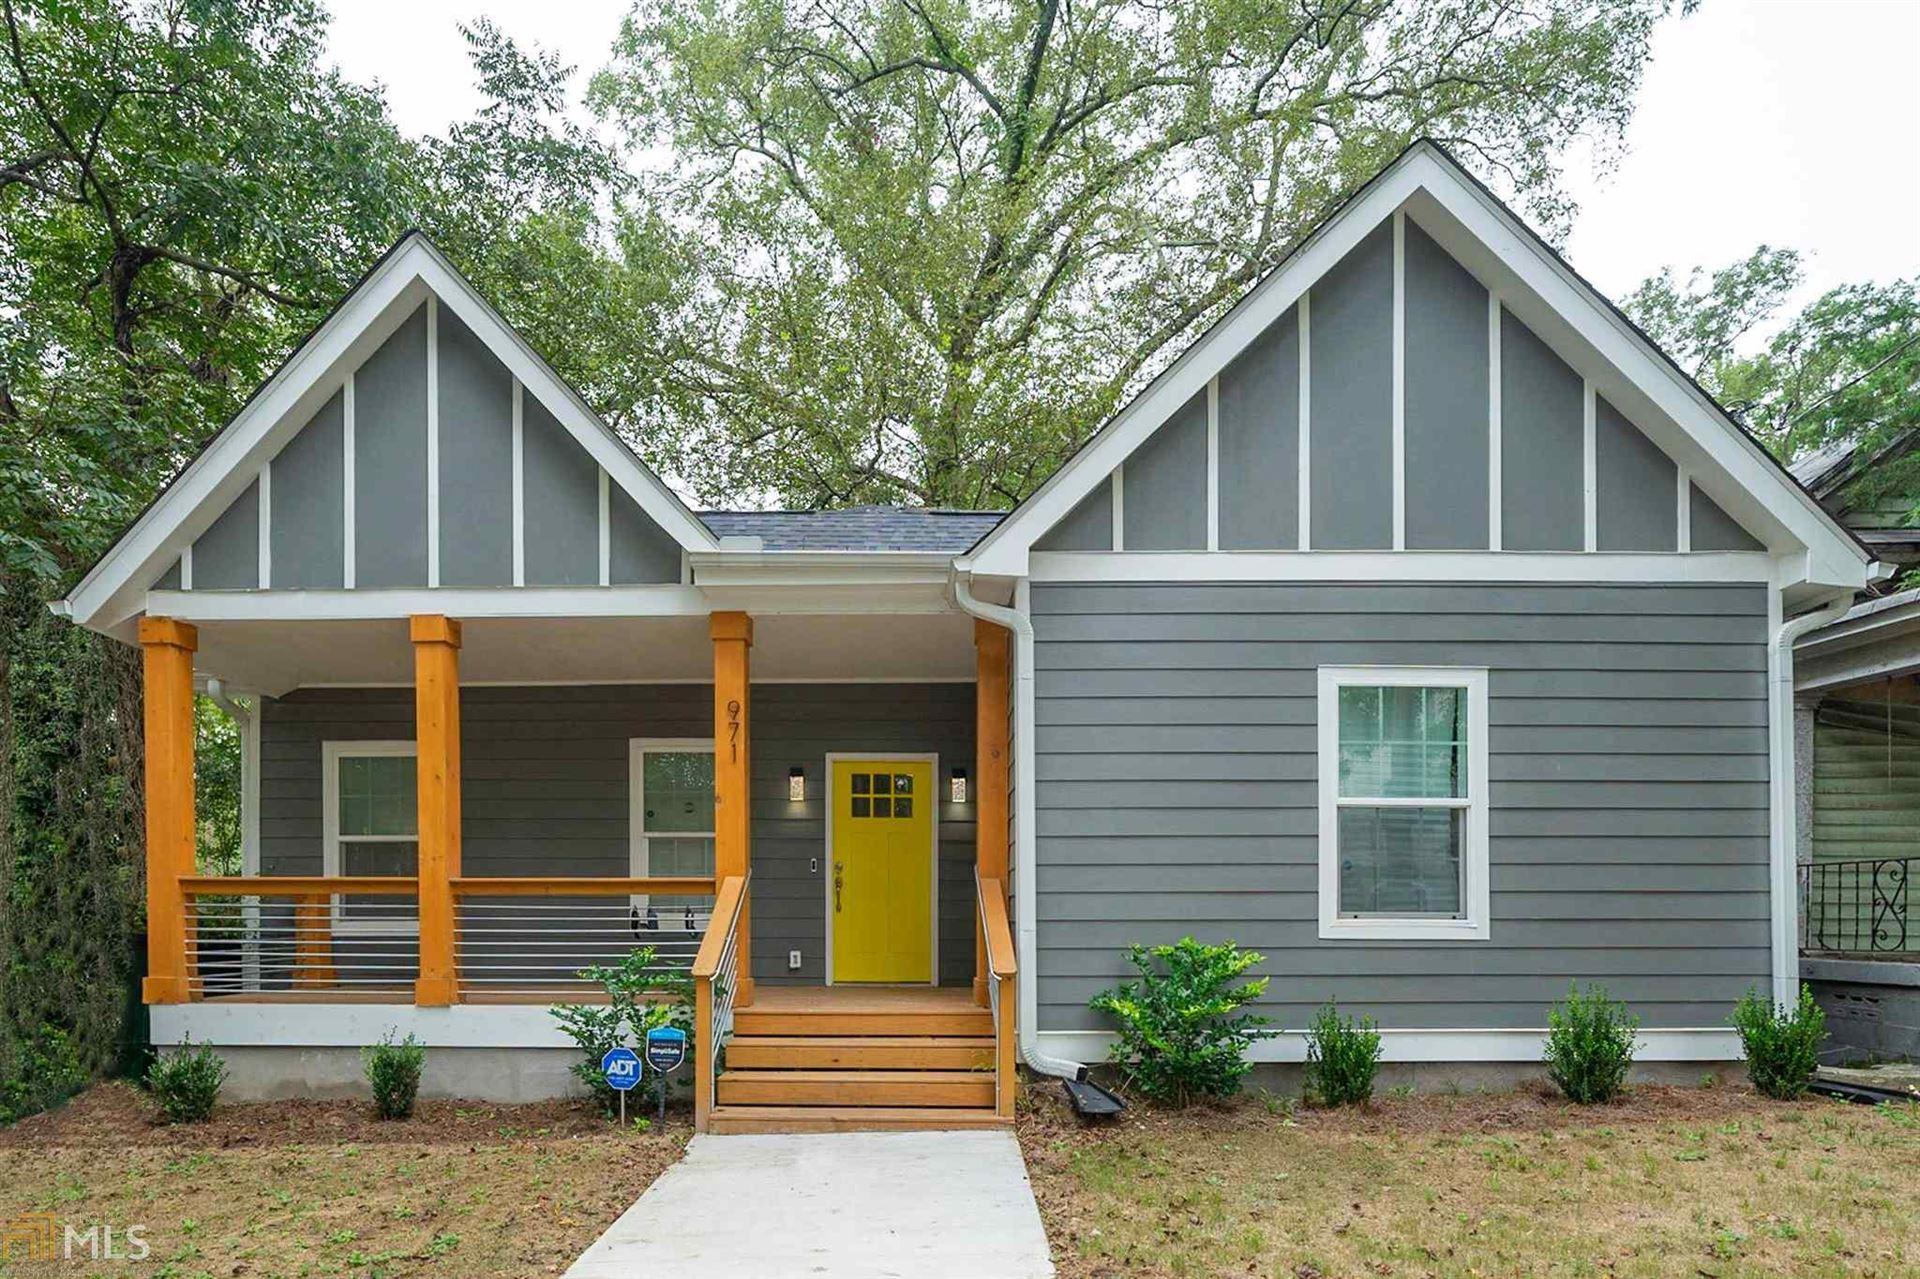 971 Smith St, Atlanta, GA 30310 - #: 8851266